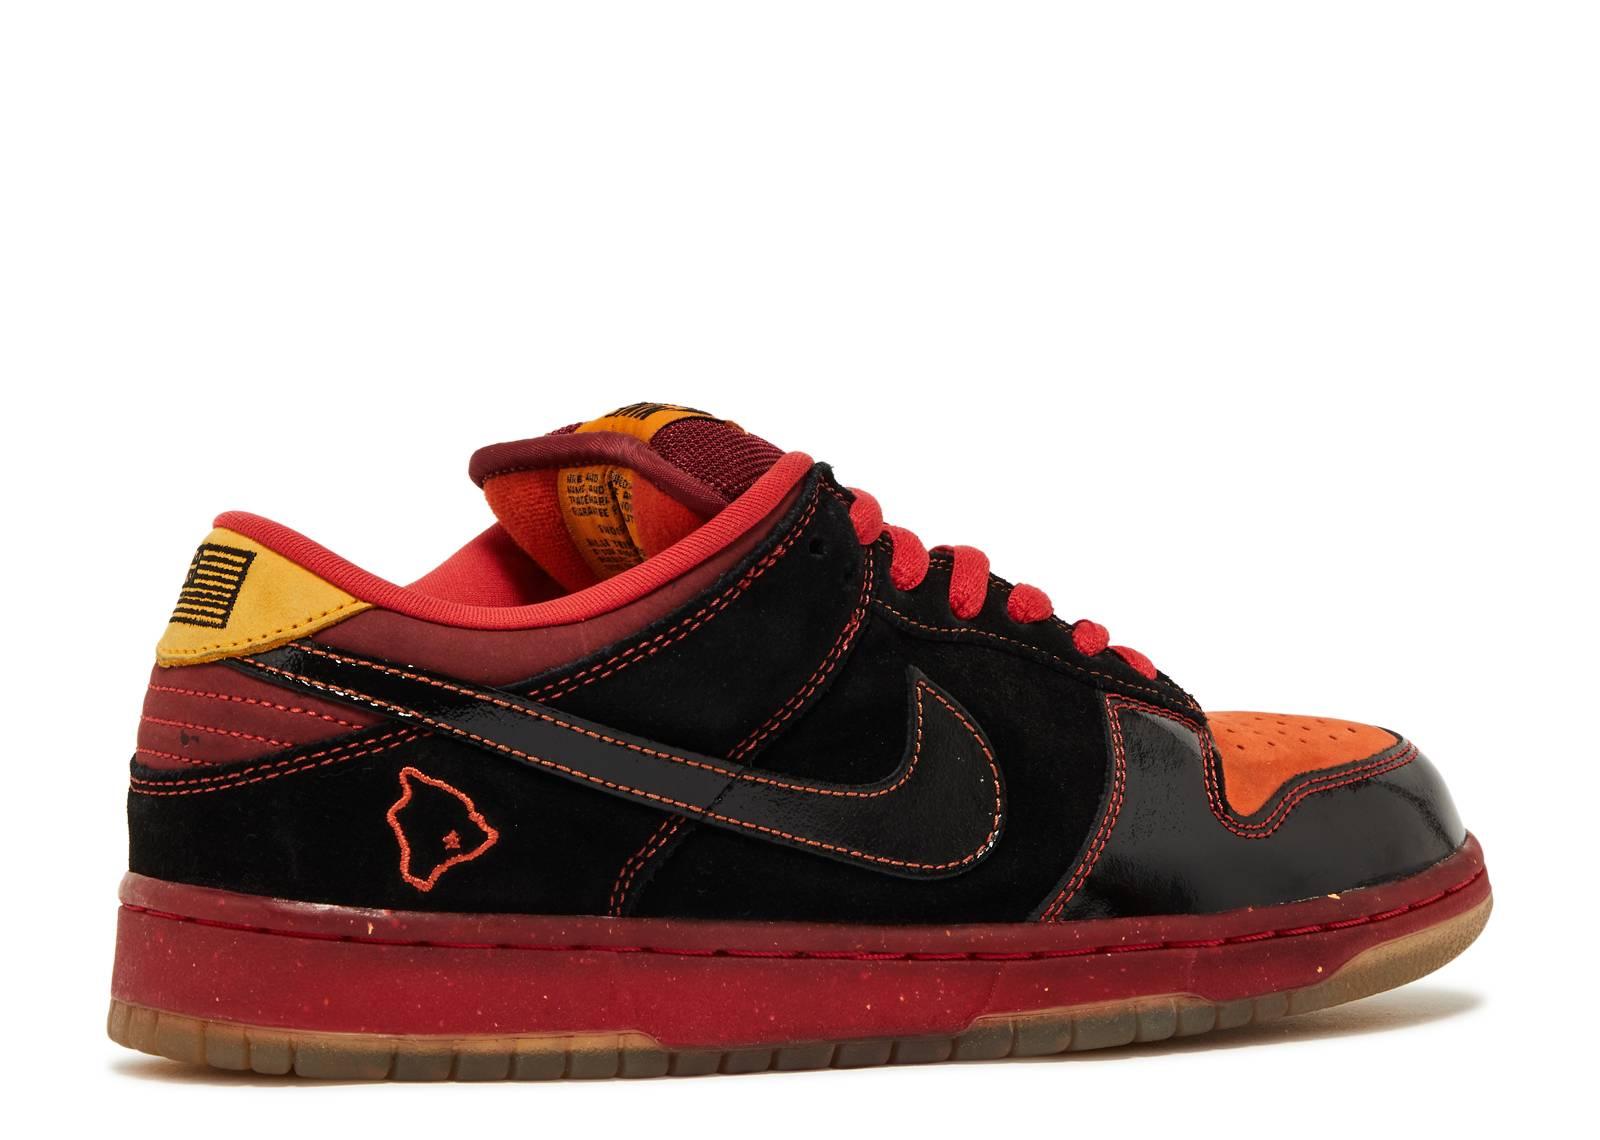 Nike Sb Dunk Low Tamaño 12 venta muy barato Manchester precio barato footlocker línea barata mejor lugar yki3uS